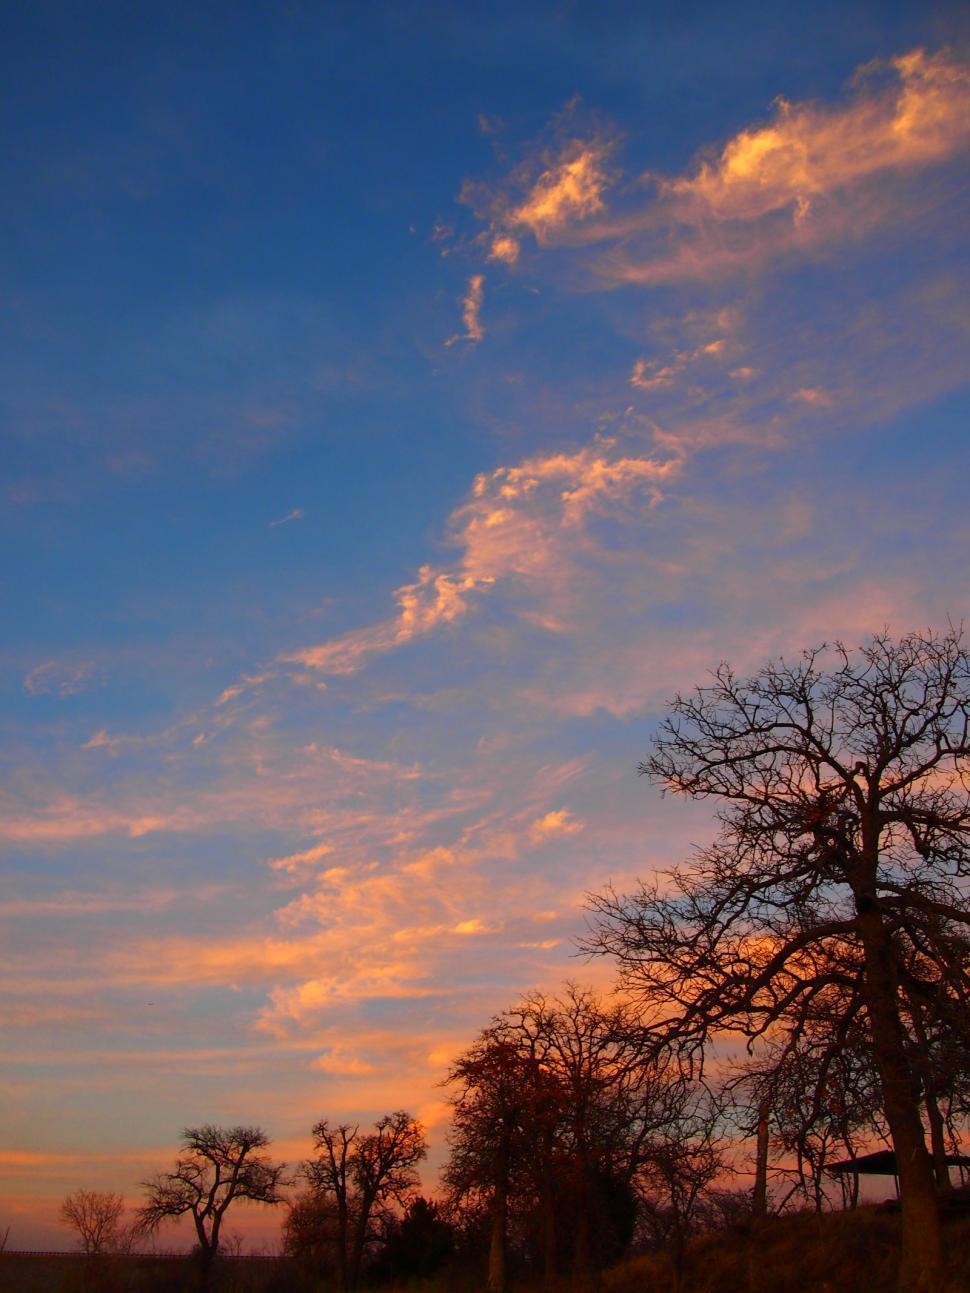 Download Free Stock Photo of Beautiful orange and blue sunset